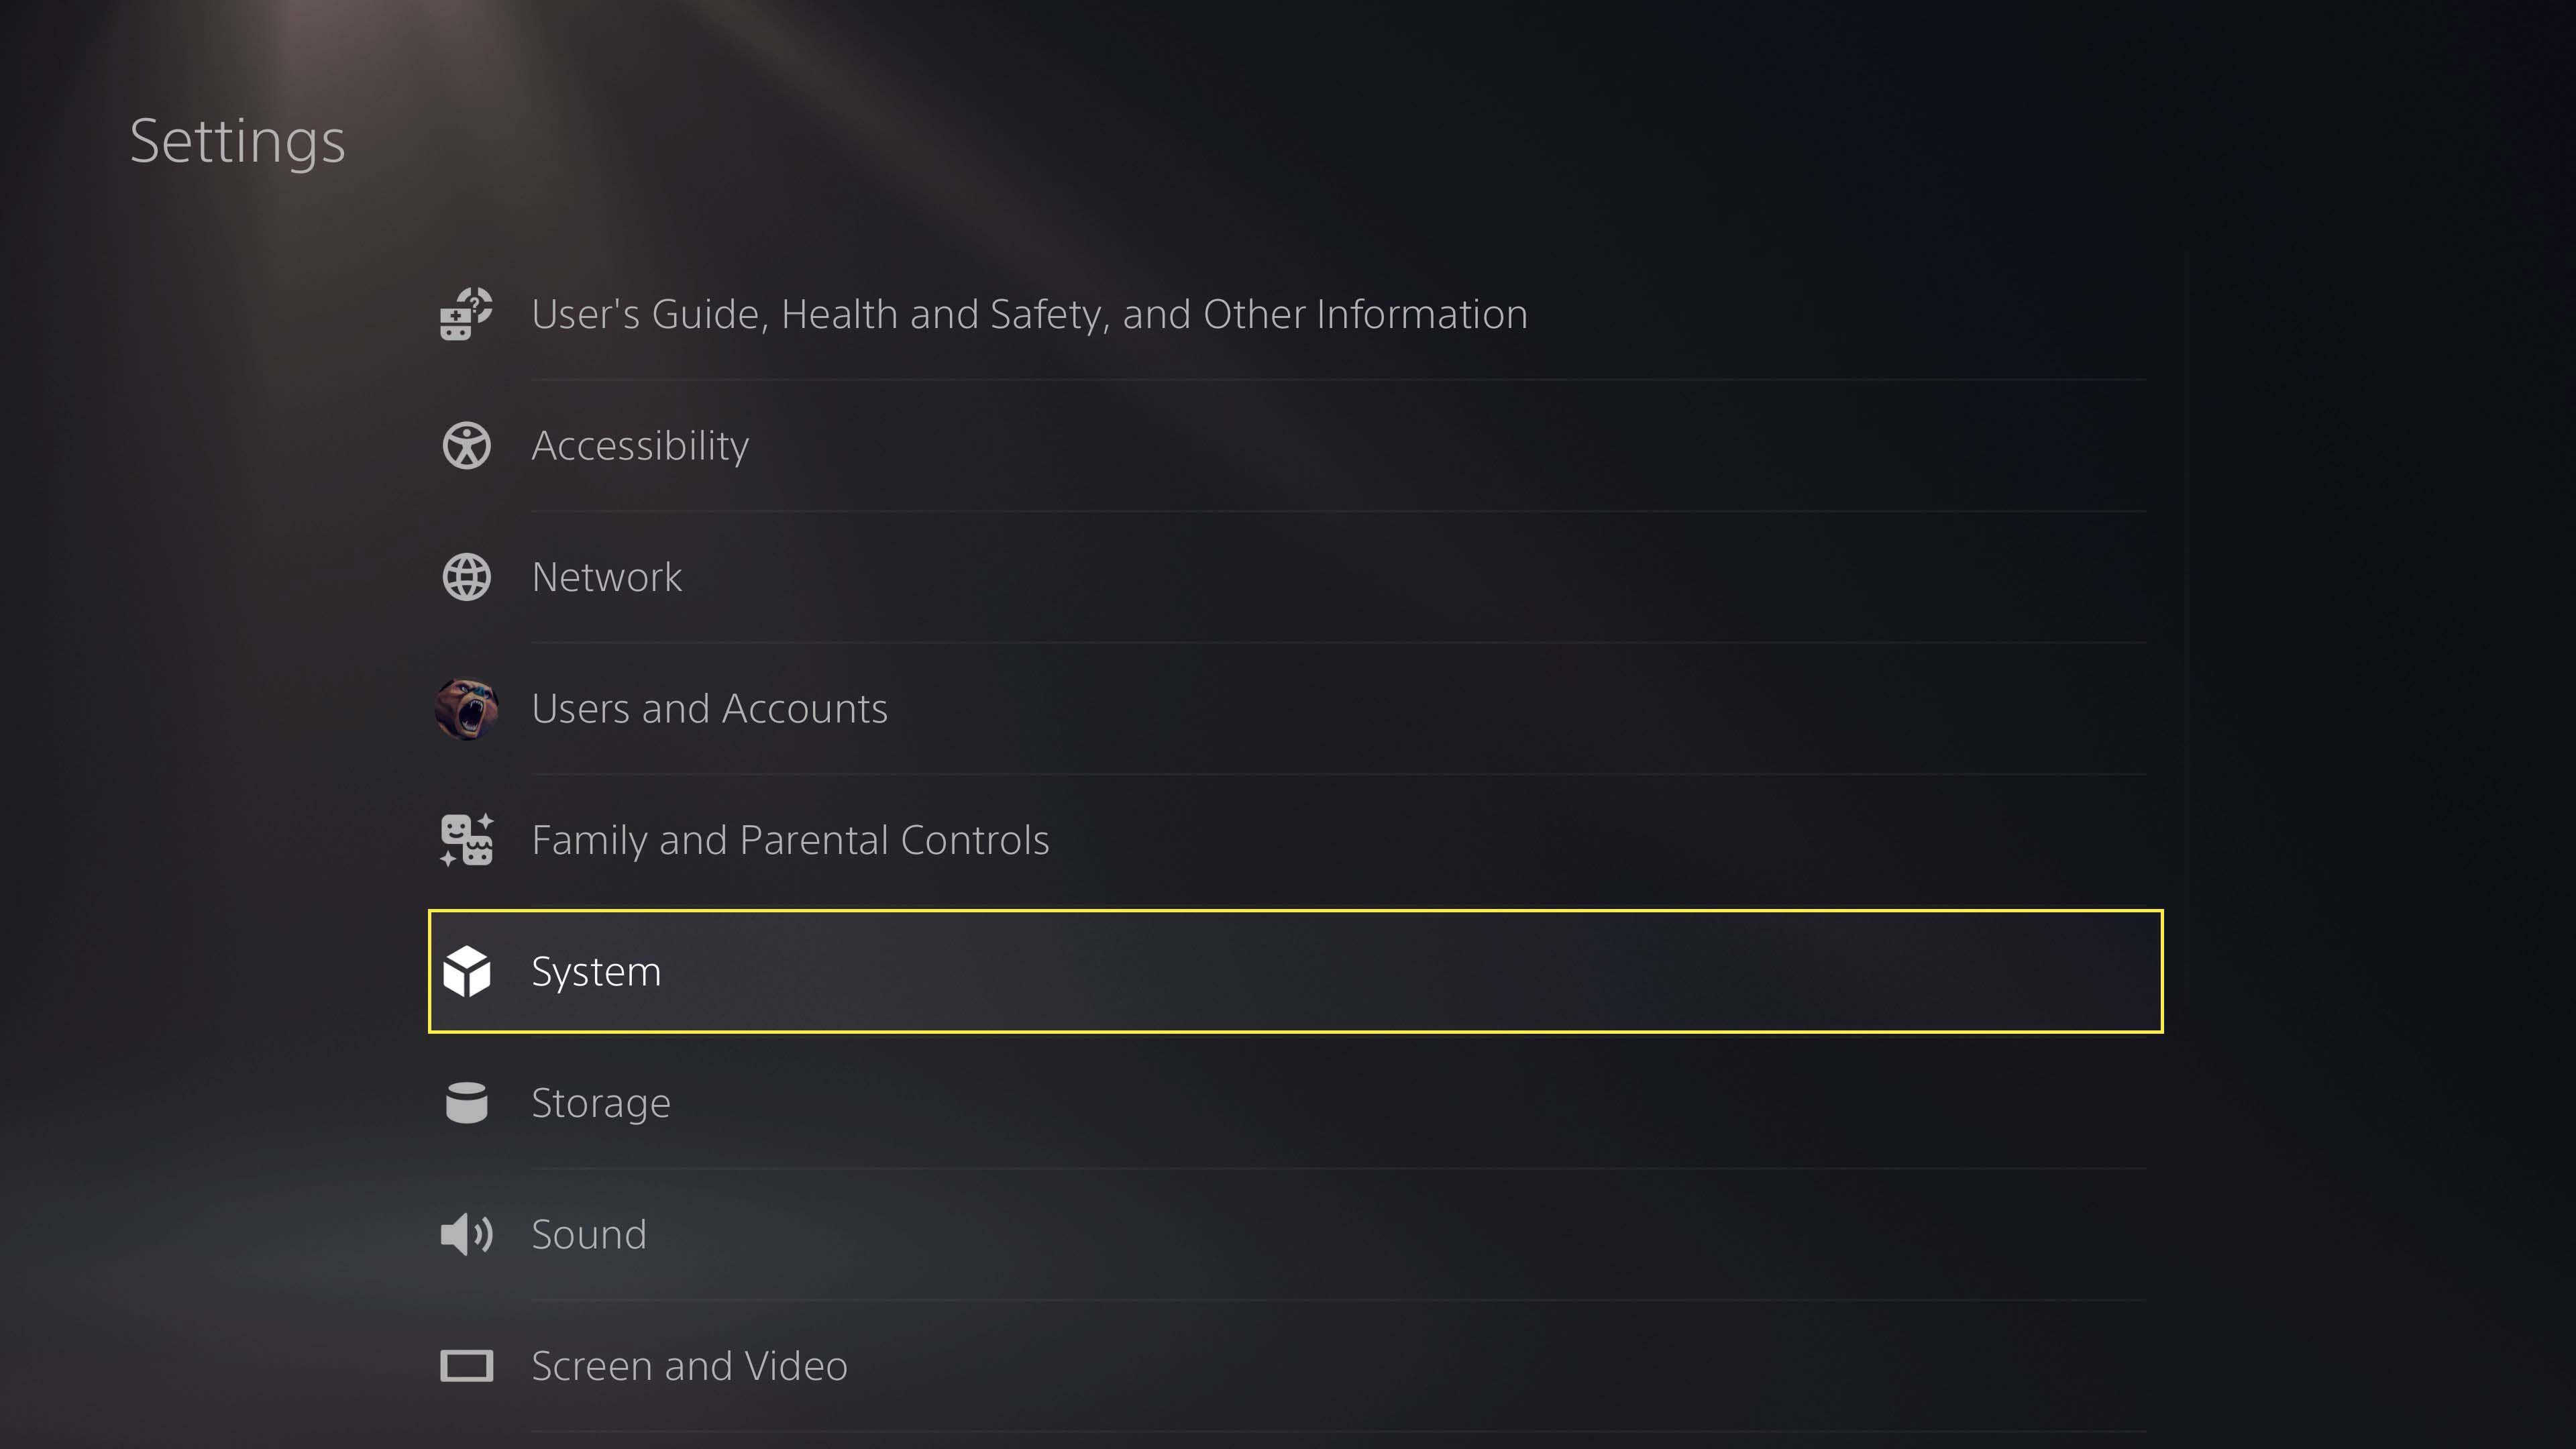 PS5 main system settings menu selecting System.